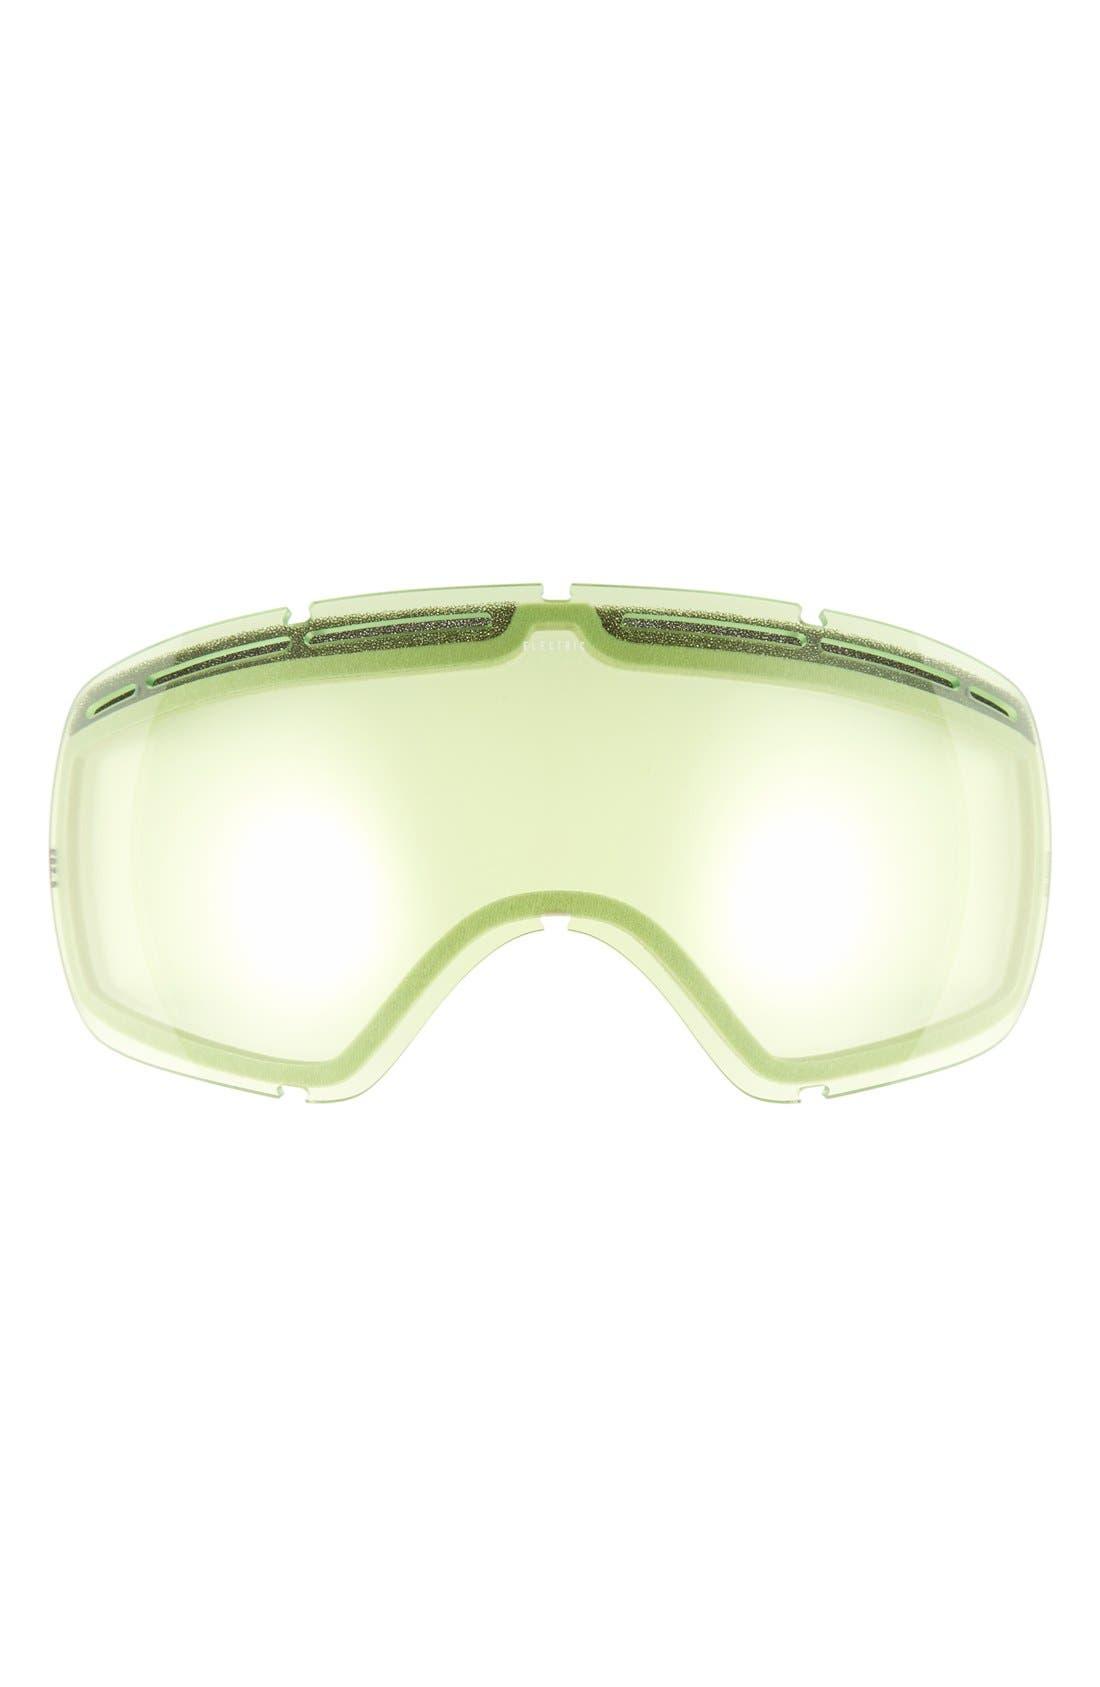 EG 2.5 215mm Snow Goggles,                             Alternate thumbnail 25, color,